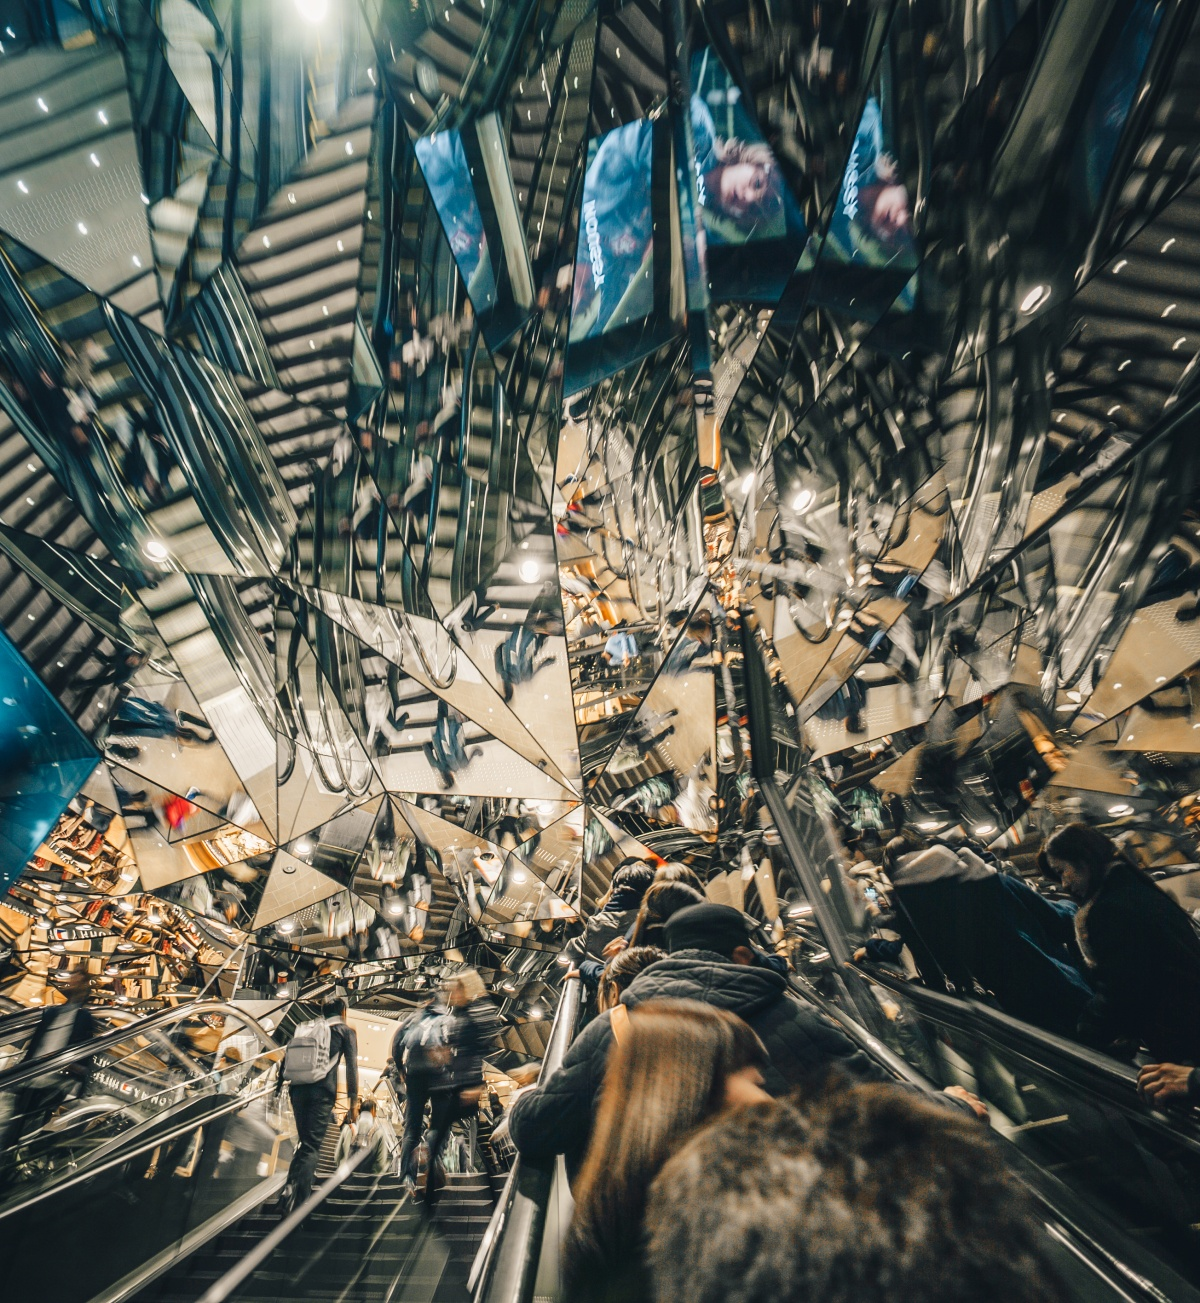 Psychedelic mirror tunnel in Harajuku, Tokyo, Japan.